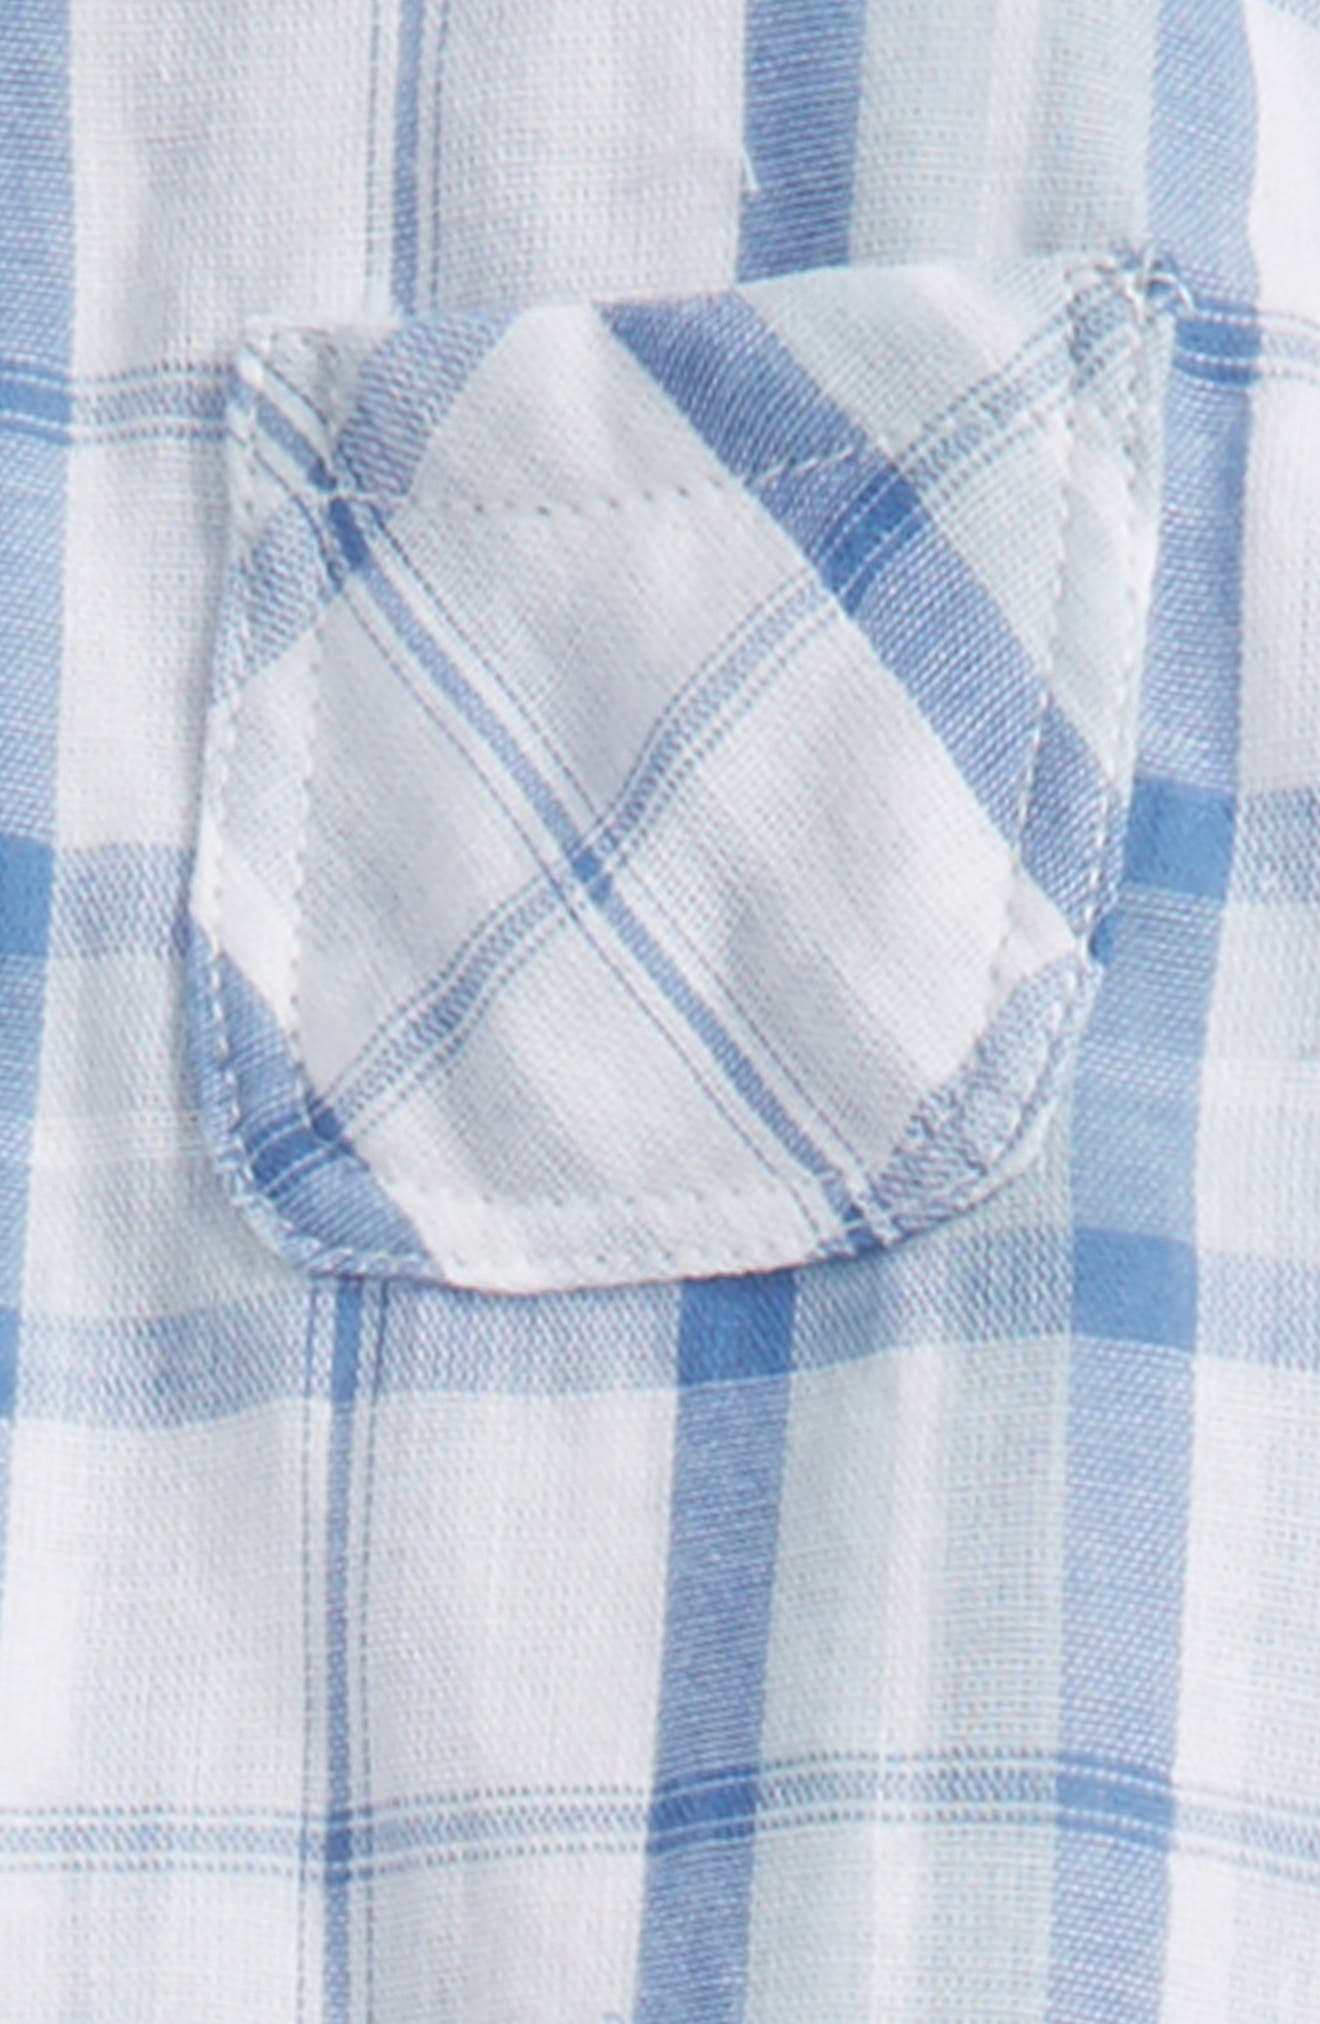 Mixed Plaid Top & Pants Set,                             Alternate thumbnail 2, color,                             Blue